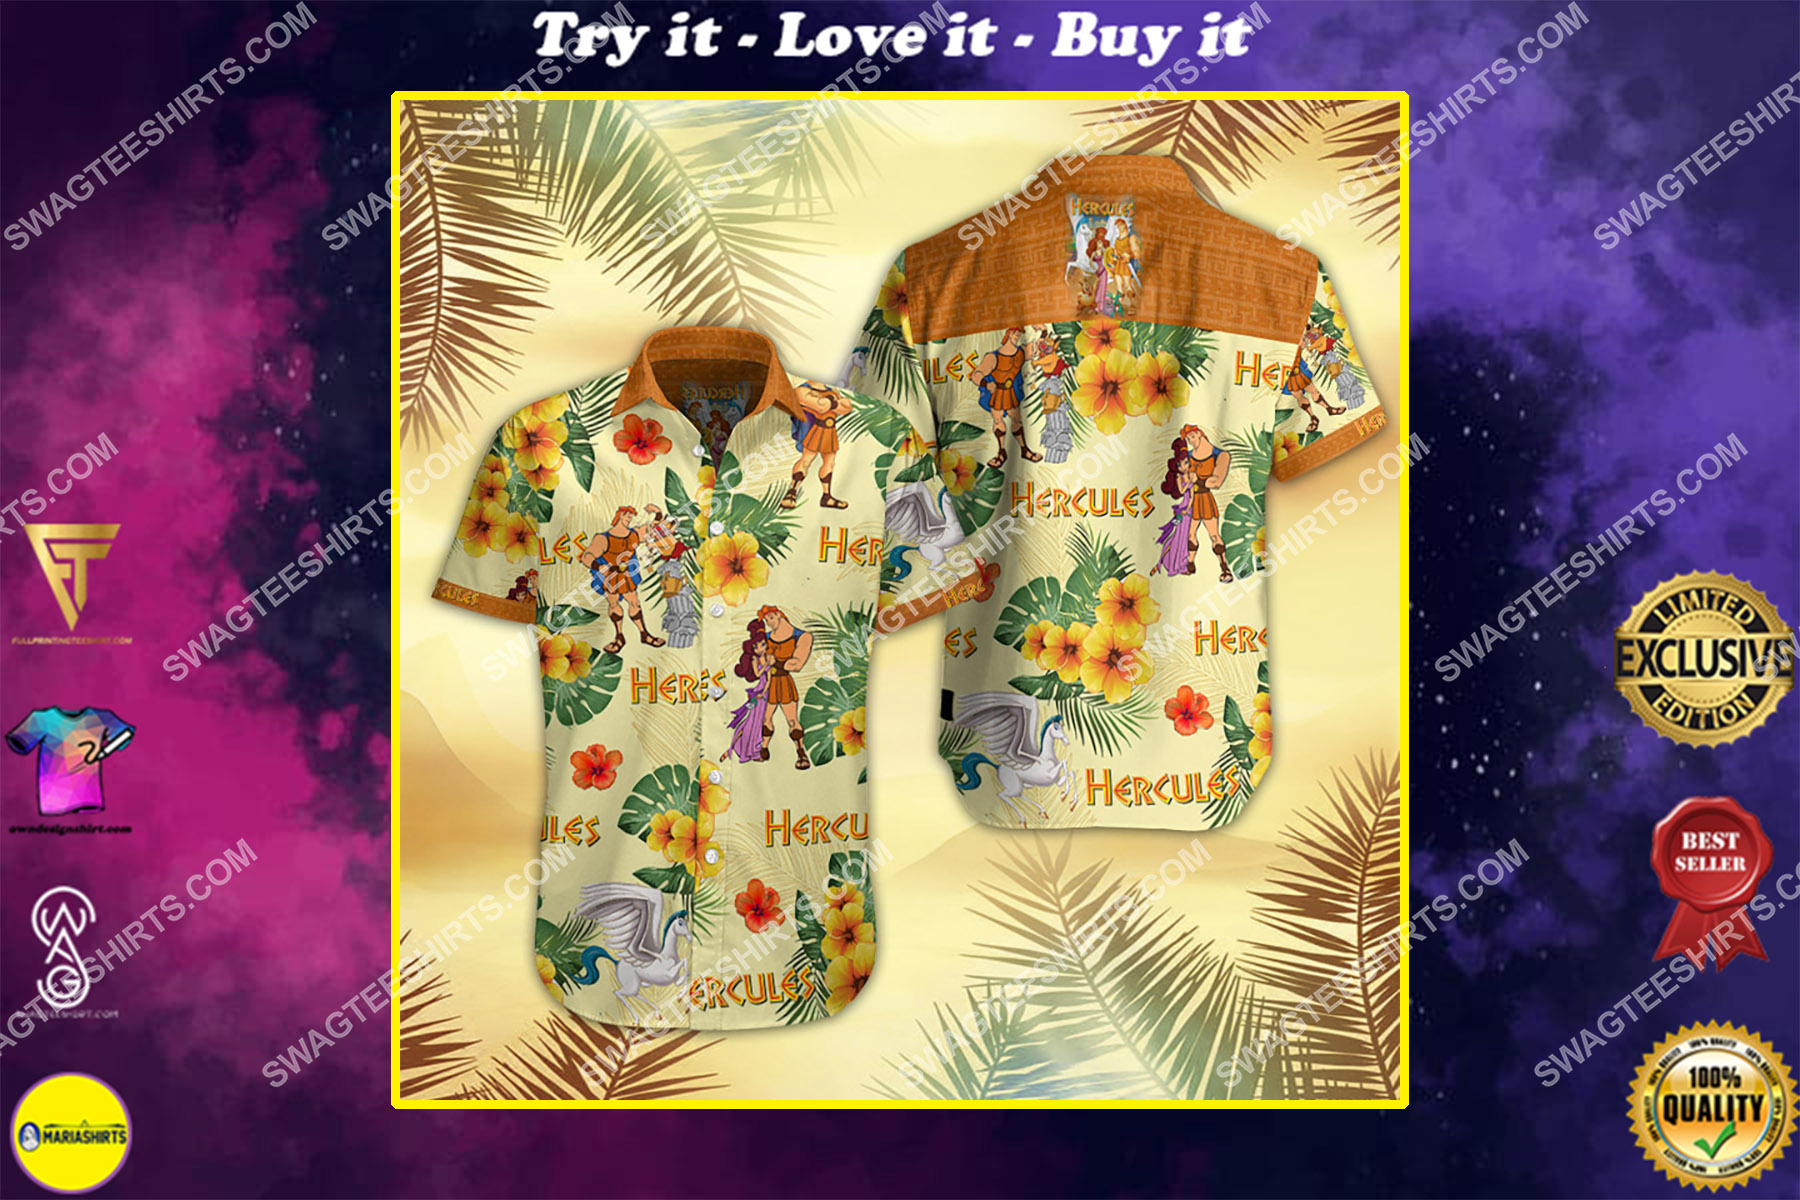 hercules movie all over print hawaiian shirt